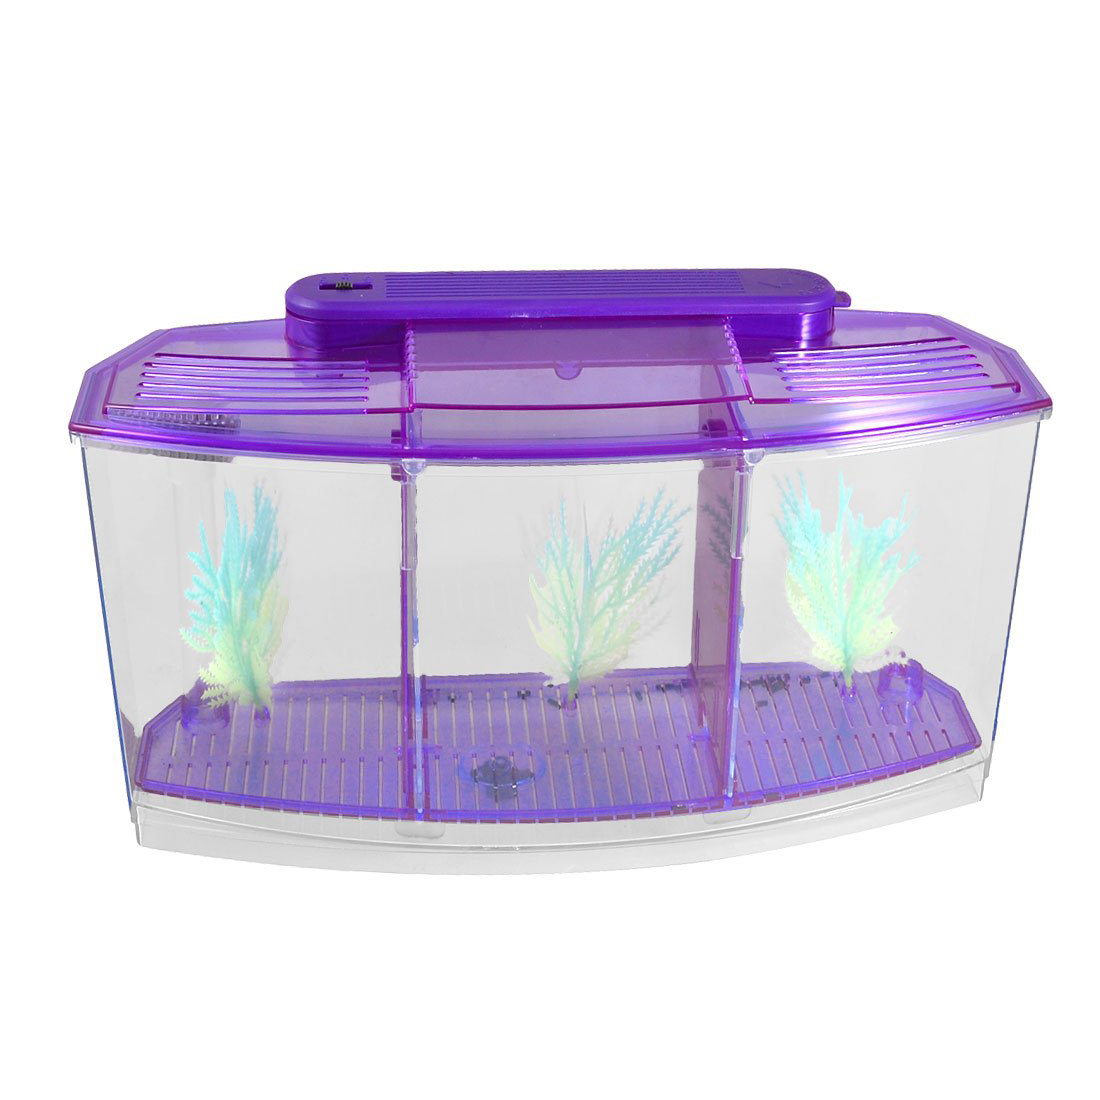 Fish aquarium price list - Bestselling Clear Plastic Battery Powered Led Lamp Mini Desktop Fish Aquarium China Mainland